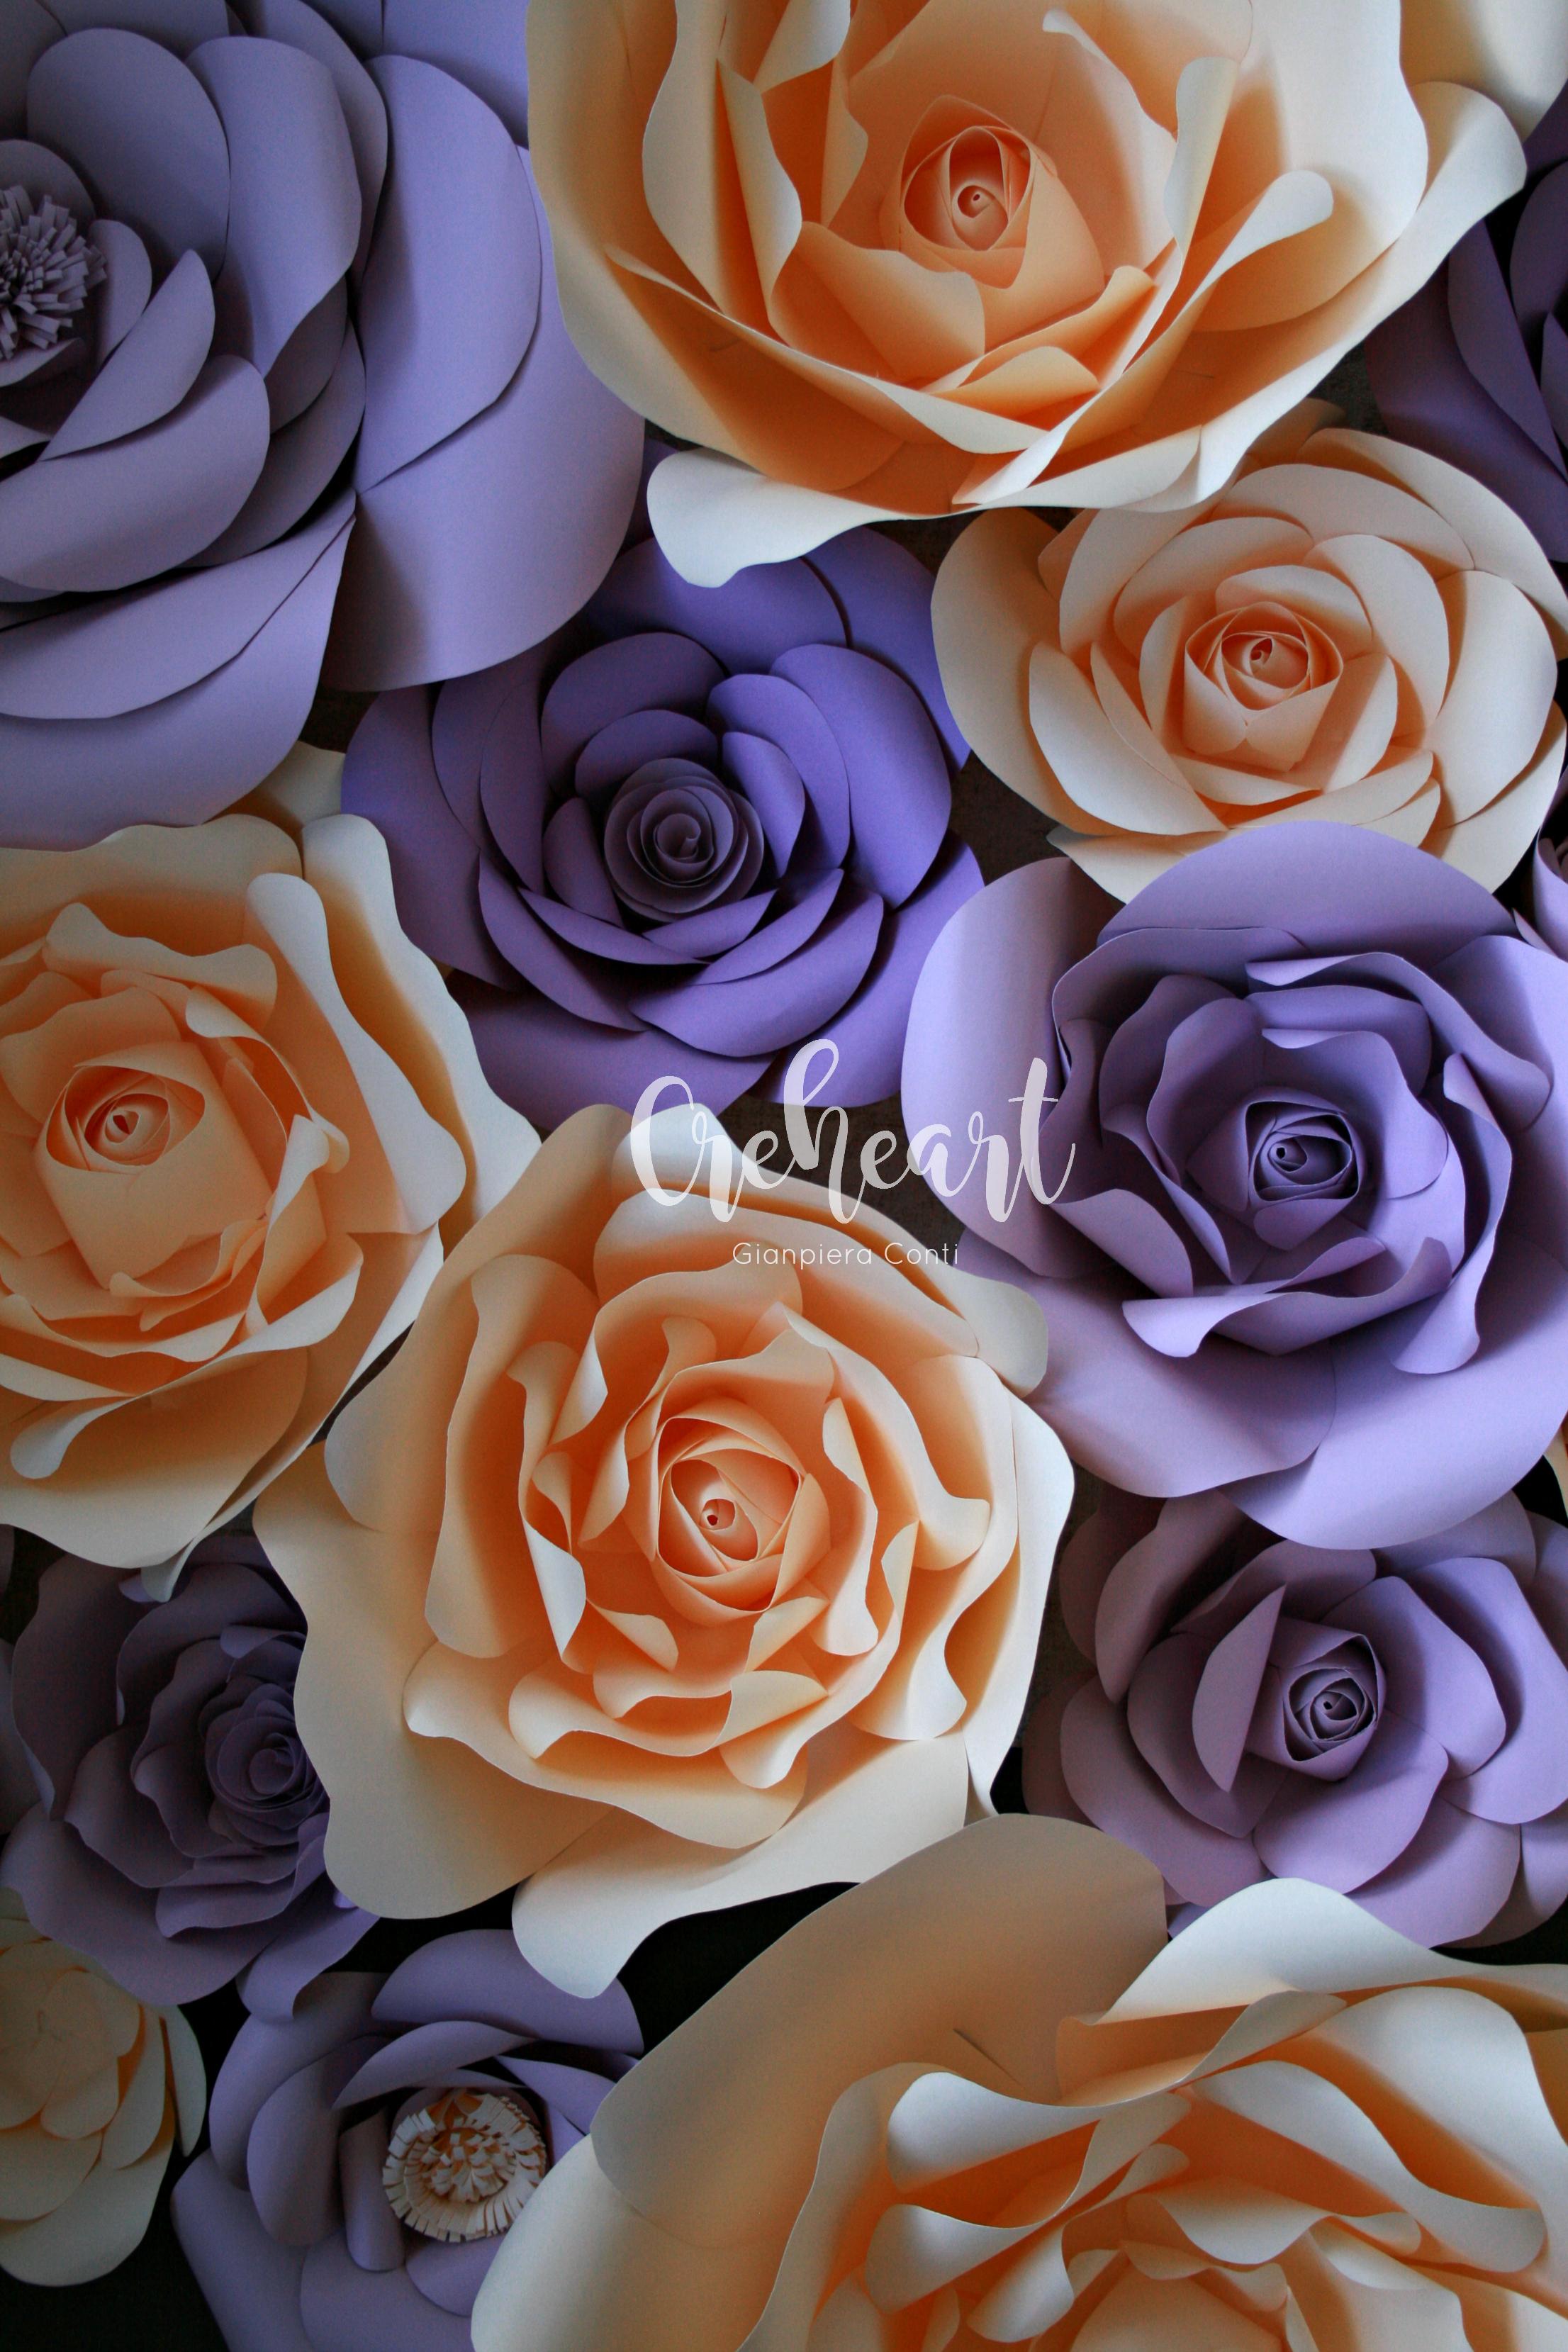 Mix Lilac Ivory Creheart.jpg